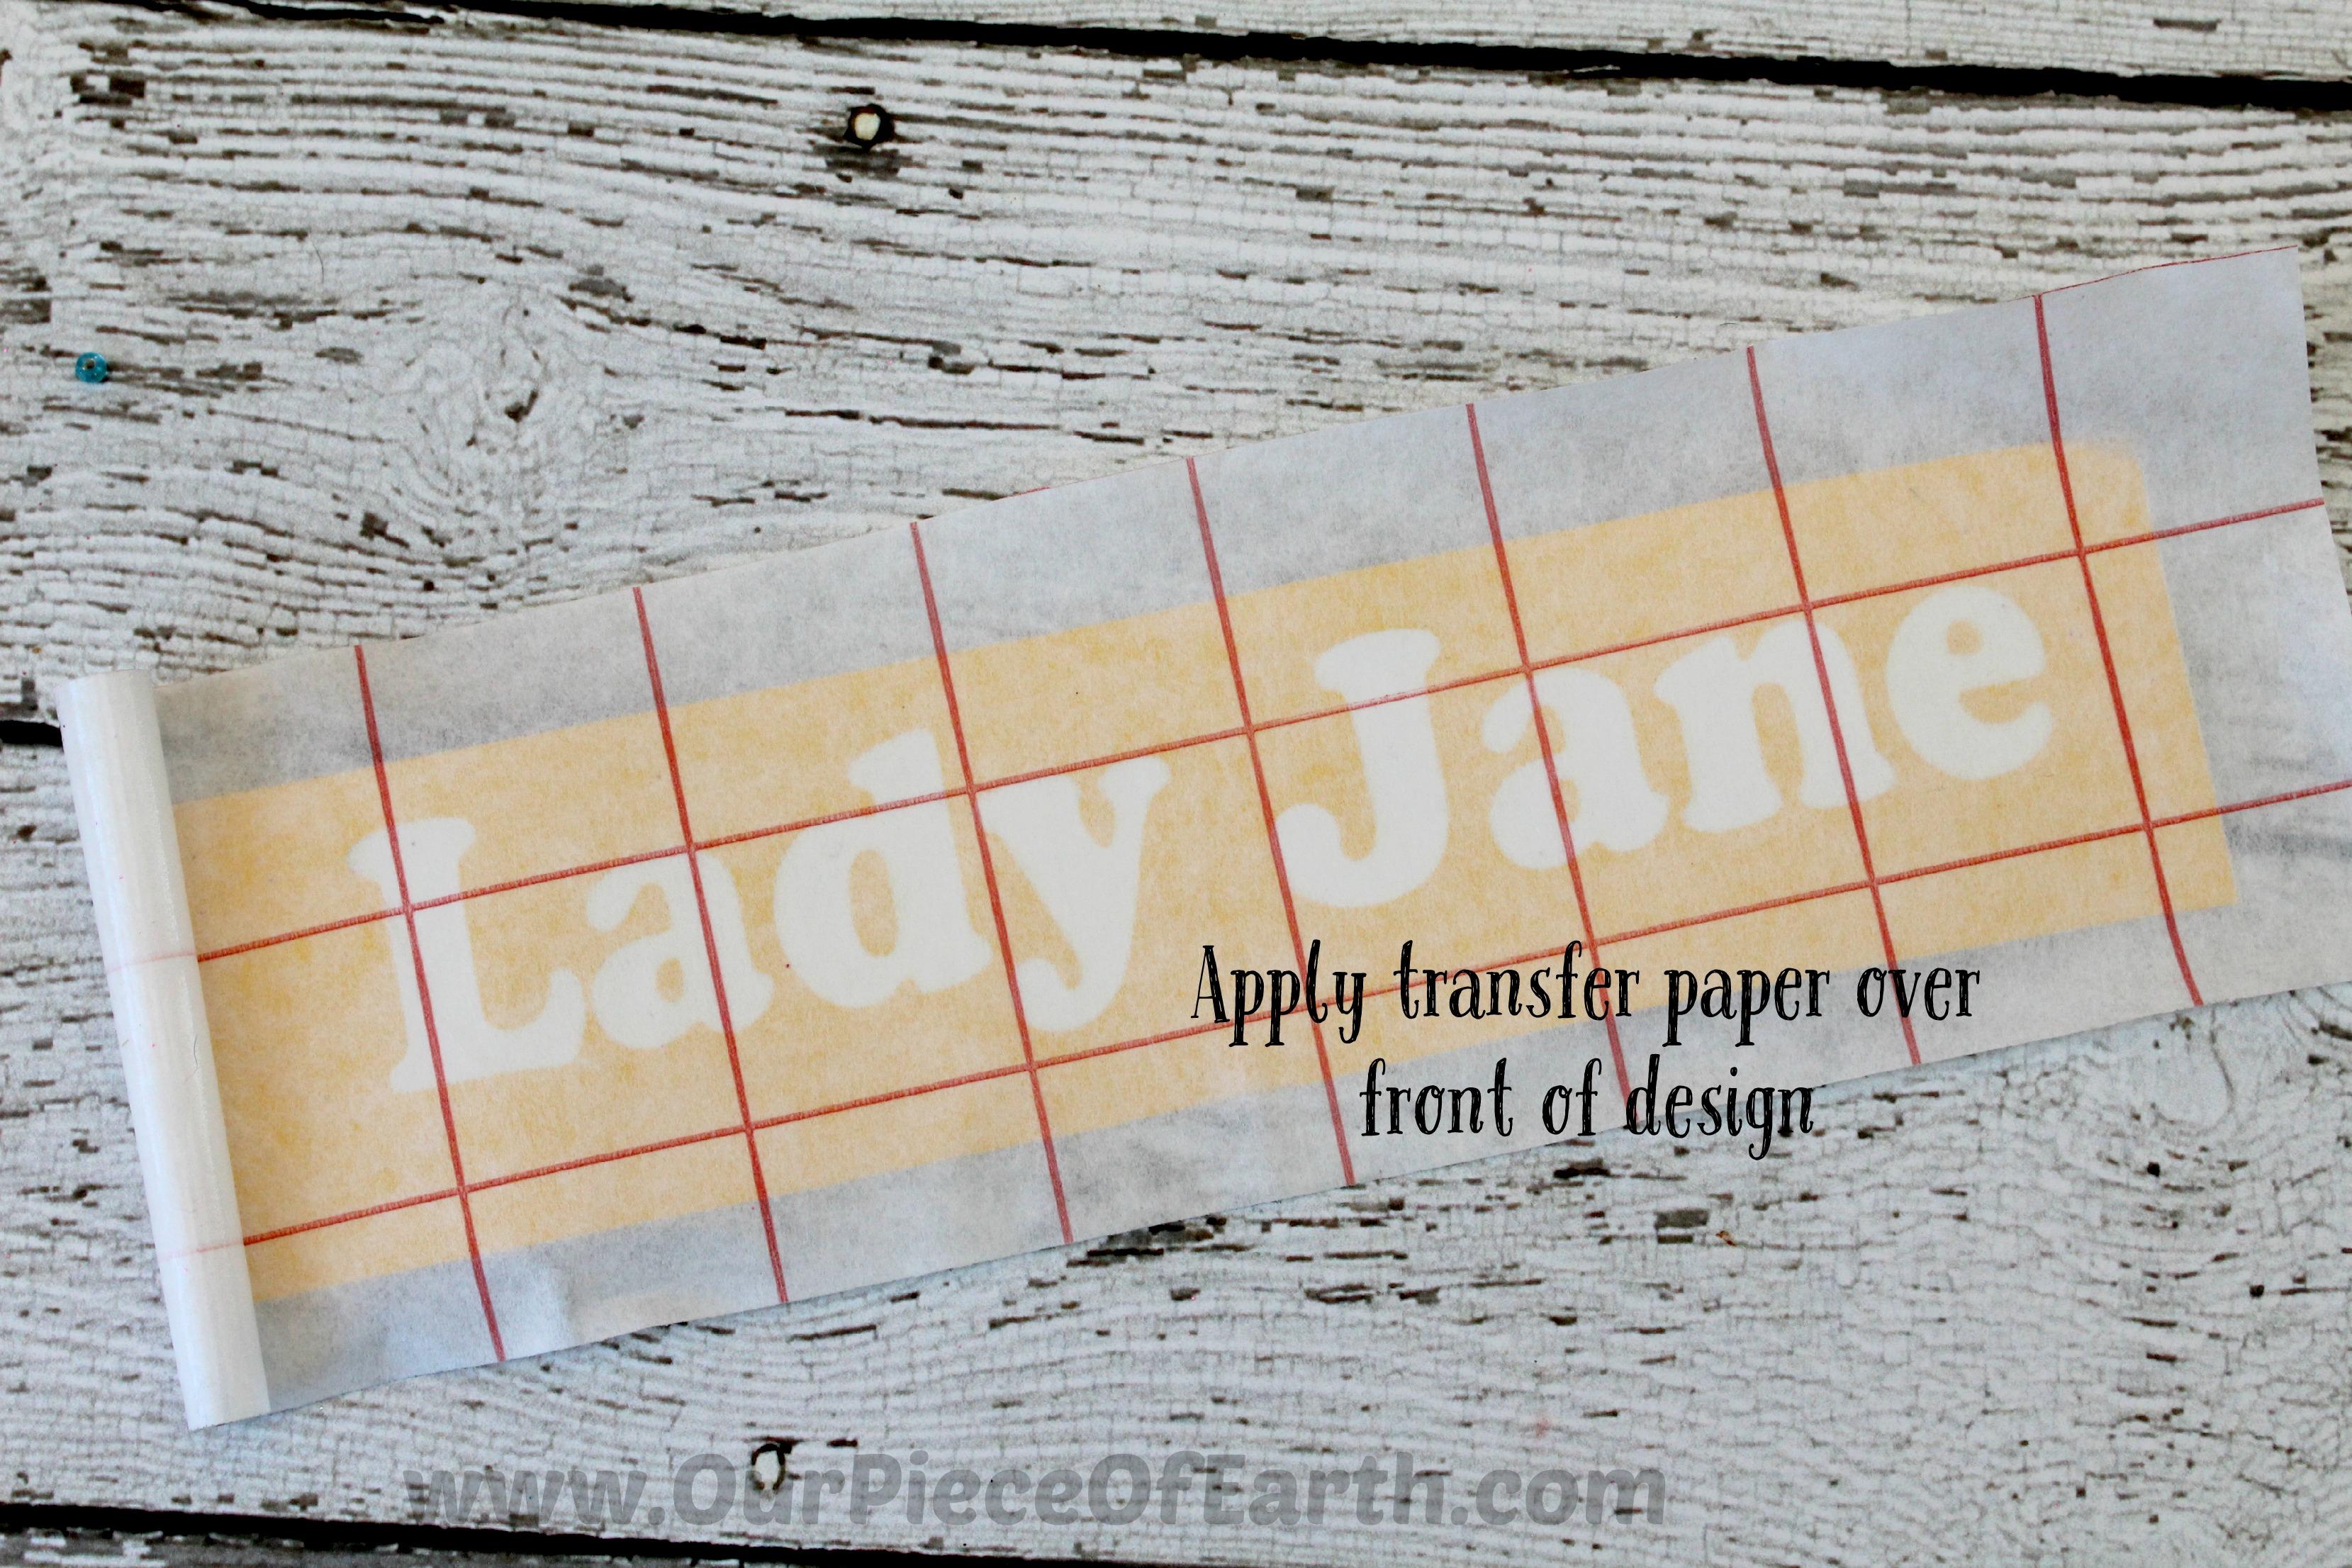 Transfer paper over design